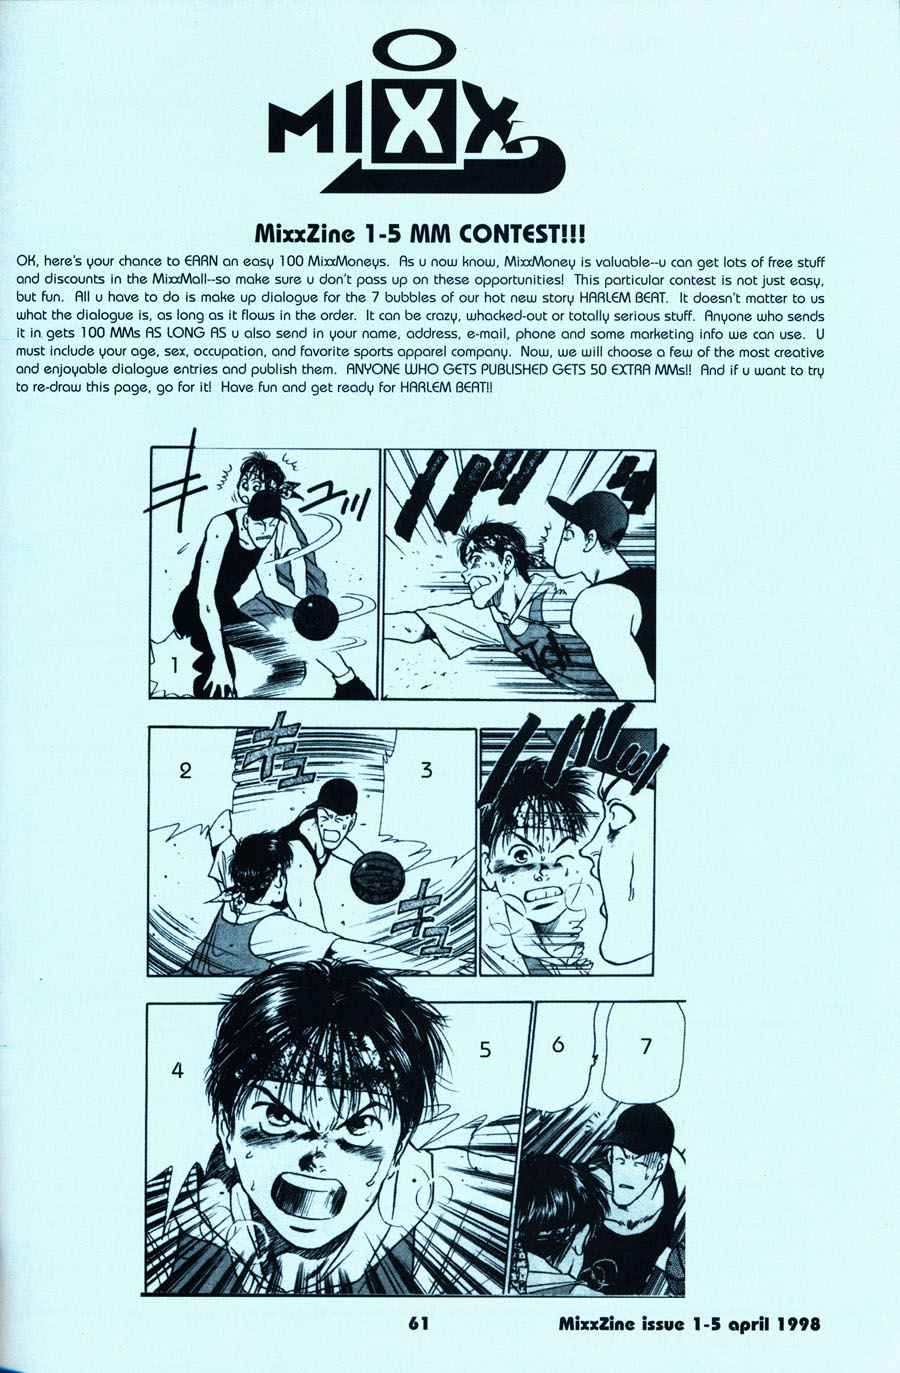 Harlem-beat-manga-mixx-zine